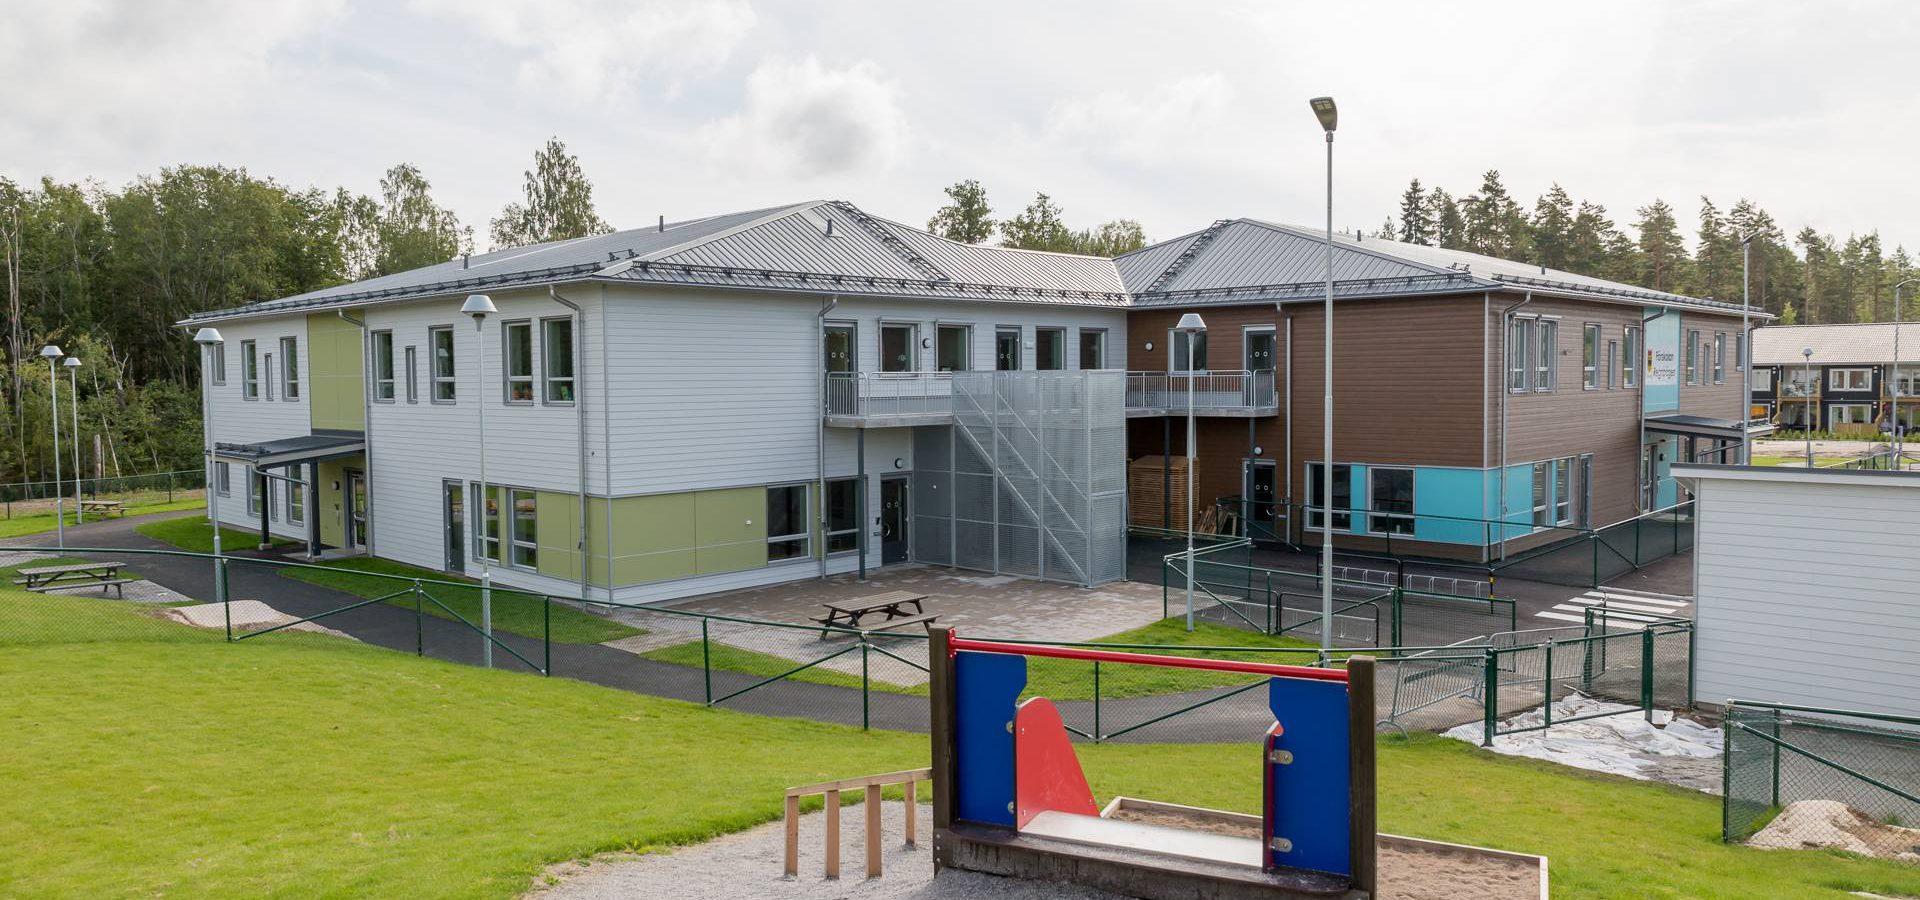 regnbgen-frskola-1-fotosf-bild